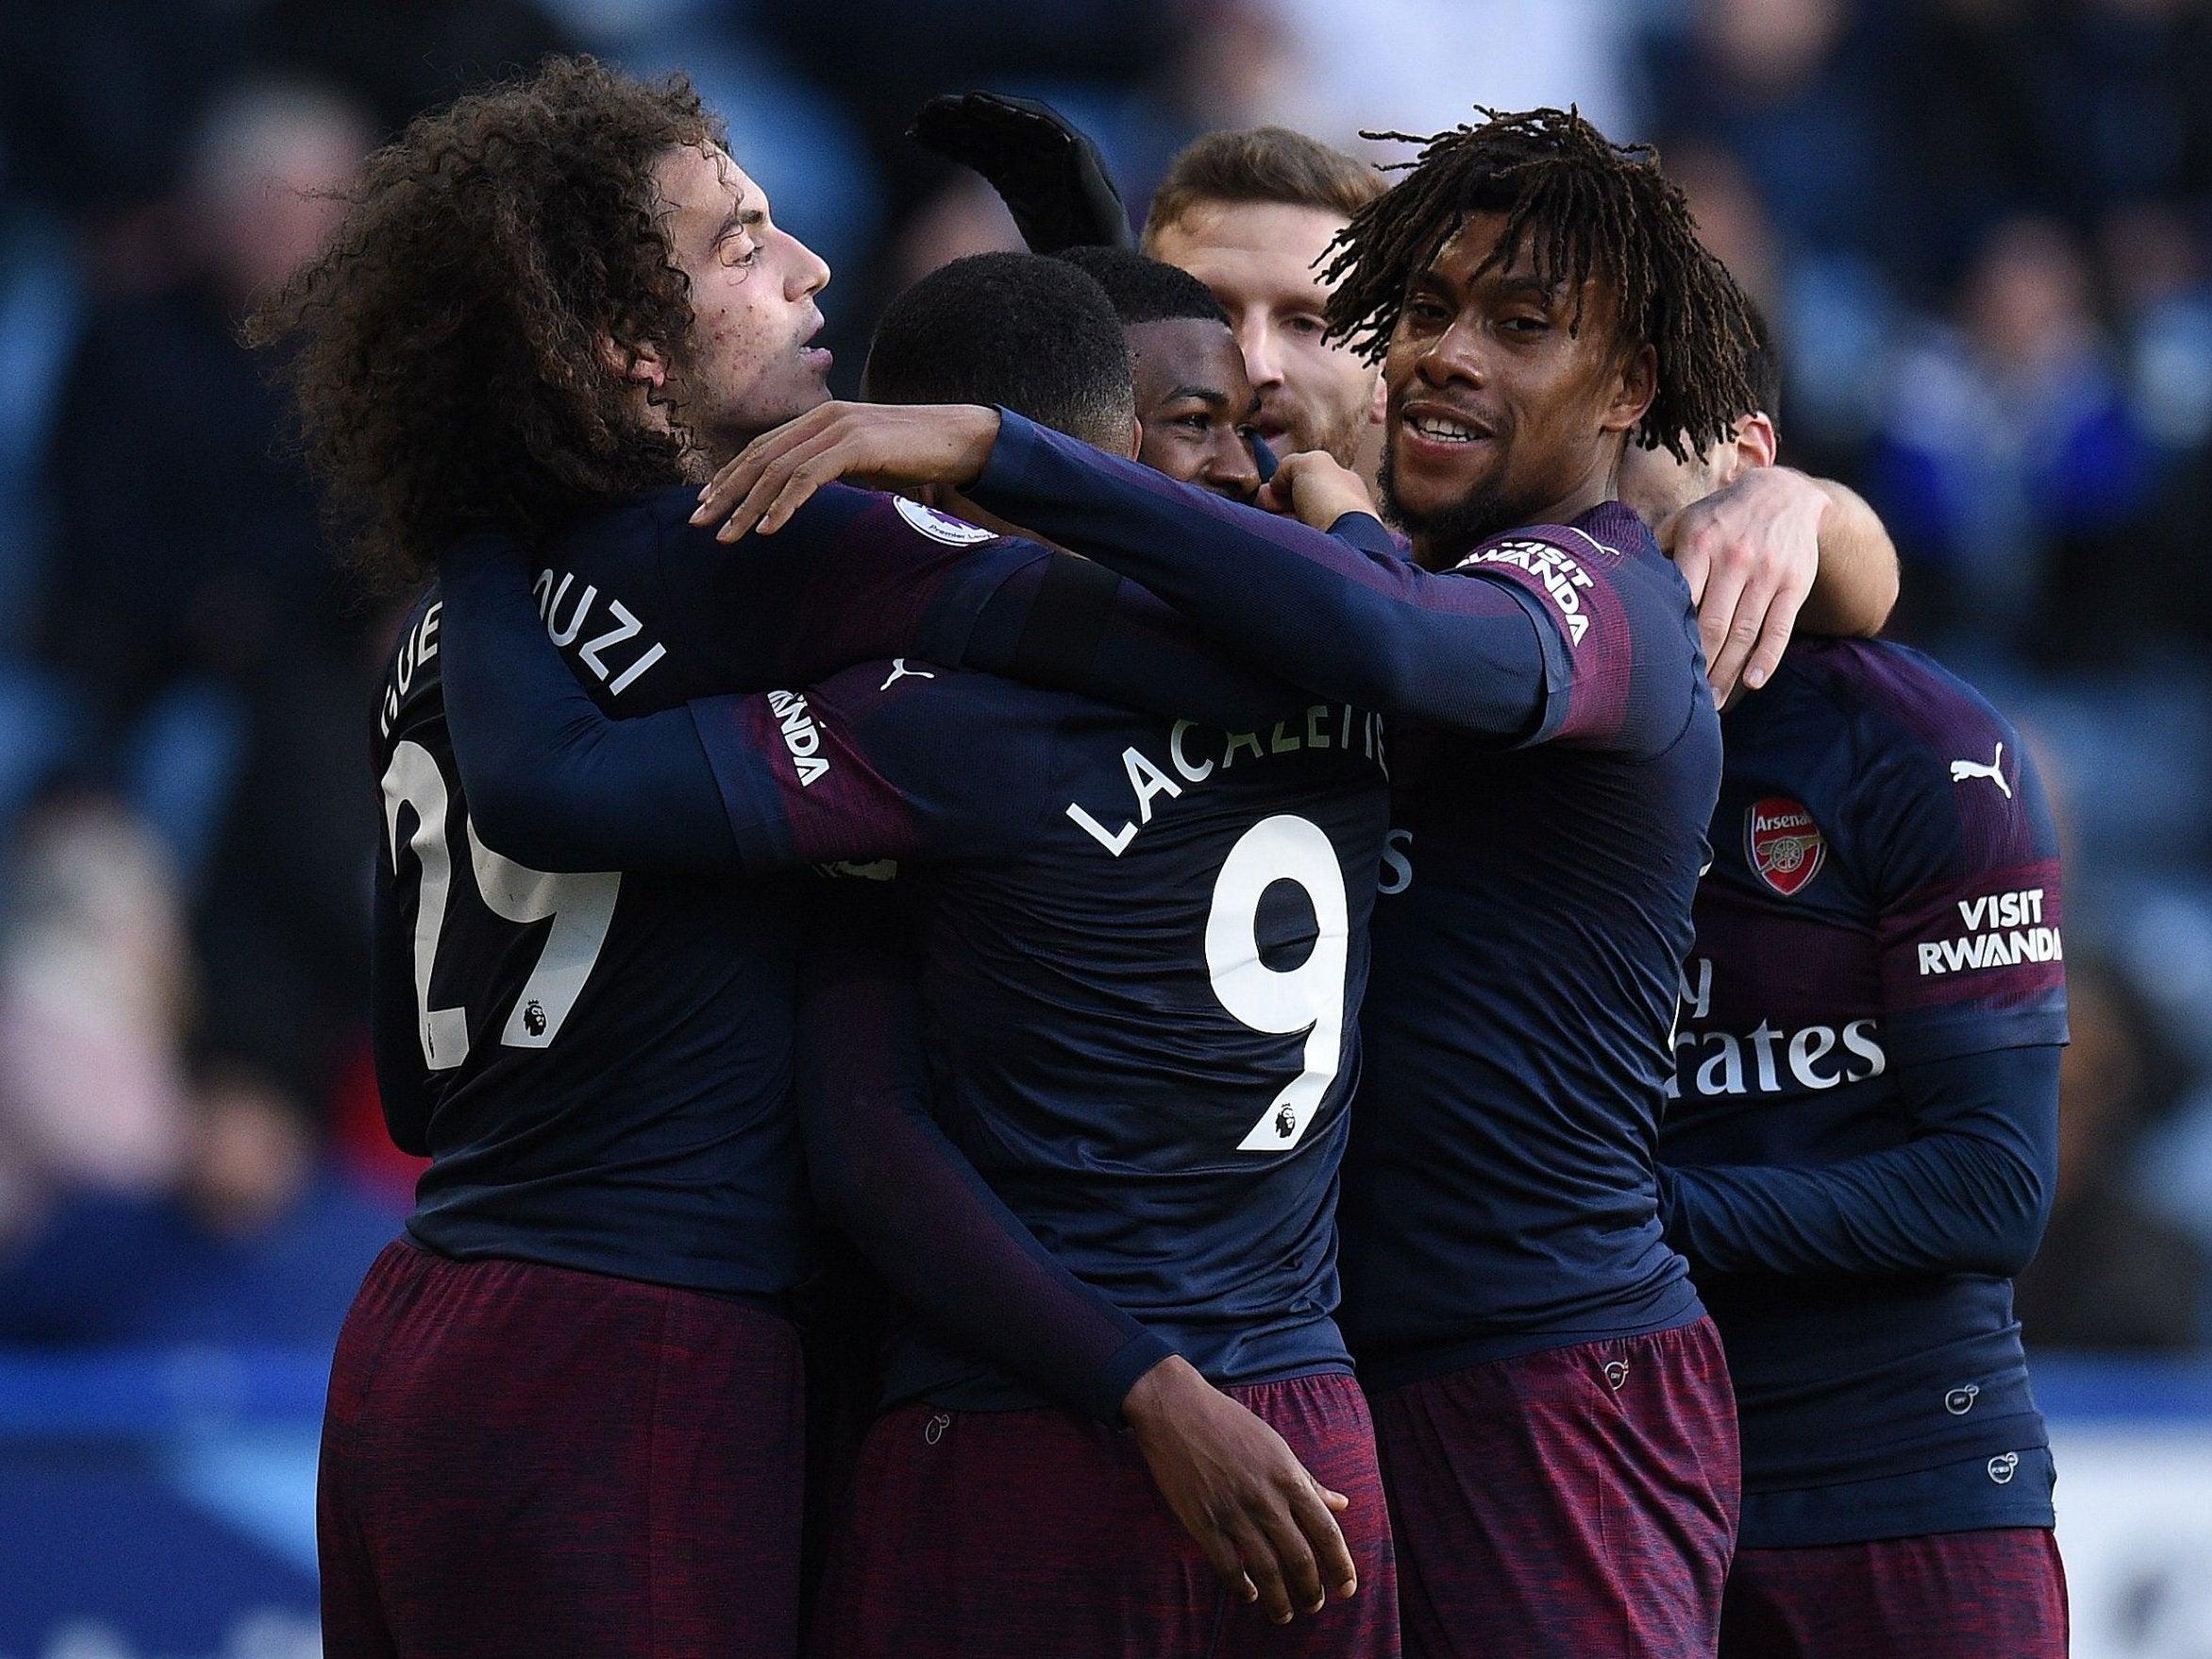 Arsenal Vs Huddersfield: Huddersfield 1-2 Arsenal: Alex Iwobi And Alexandre